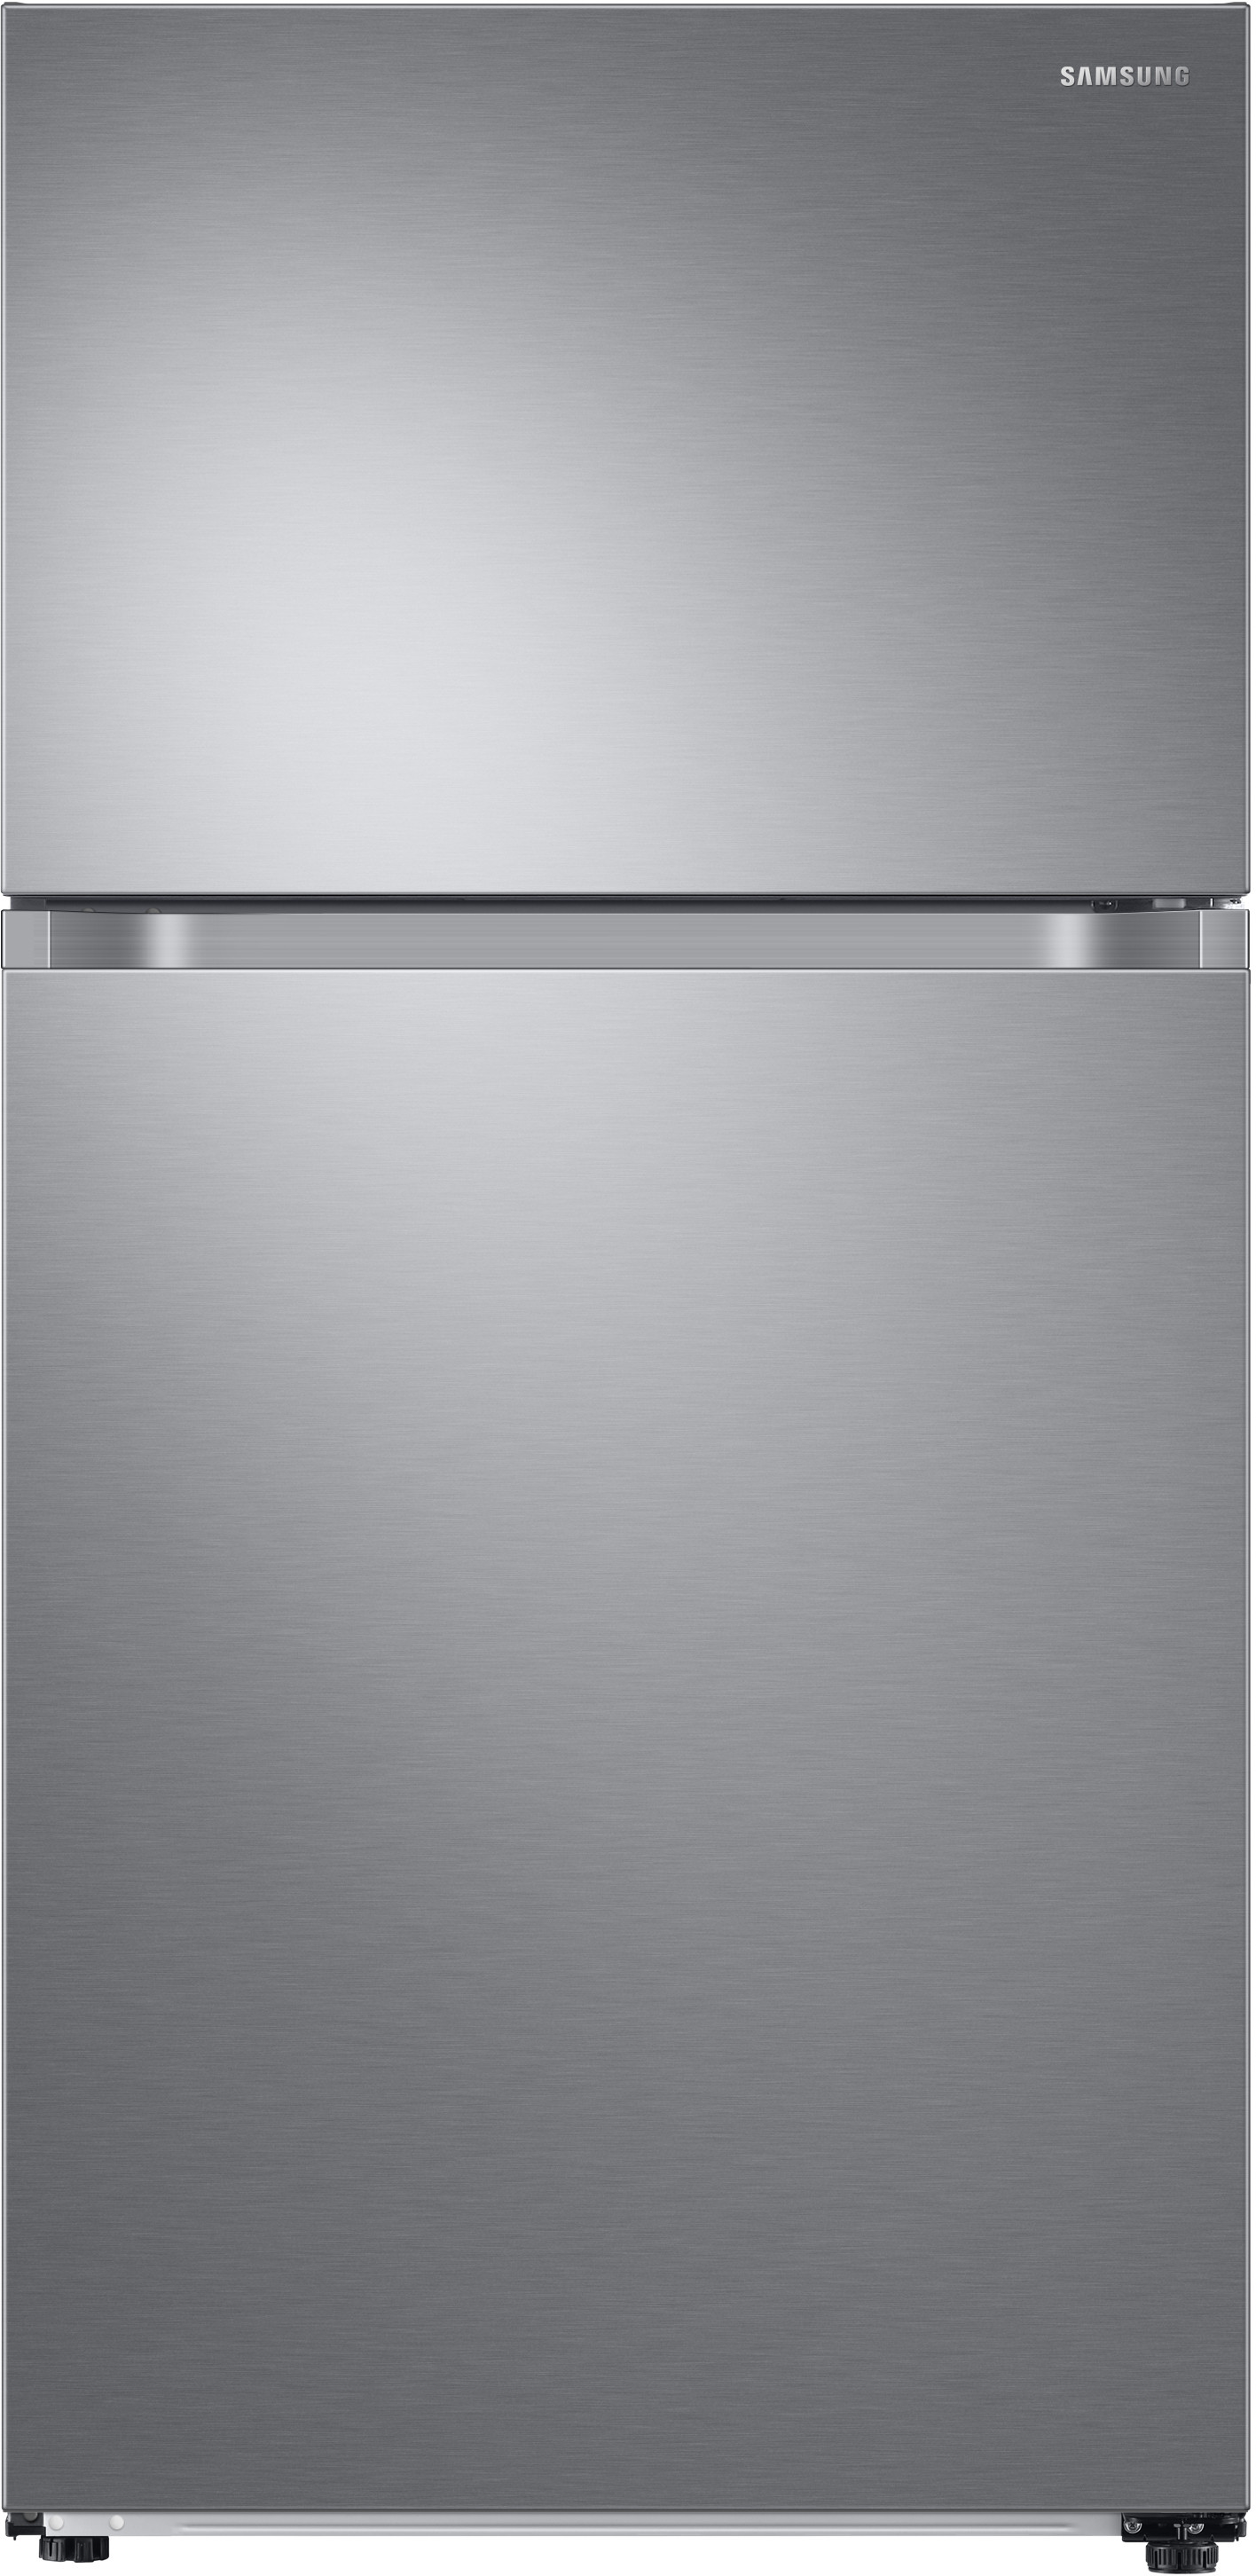 Best Top Freezer Refrigerators 2020.Samsung Rt21m6215sr